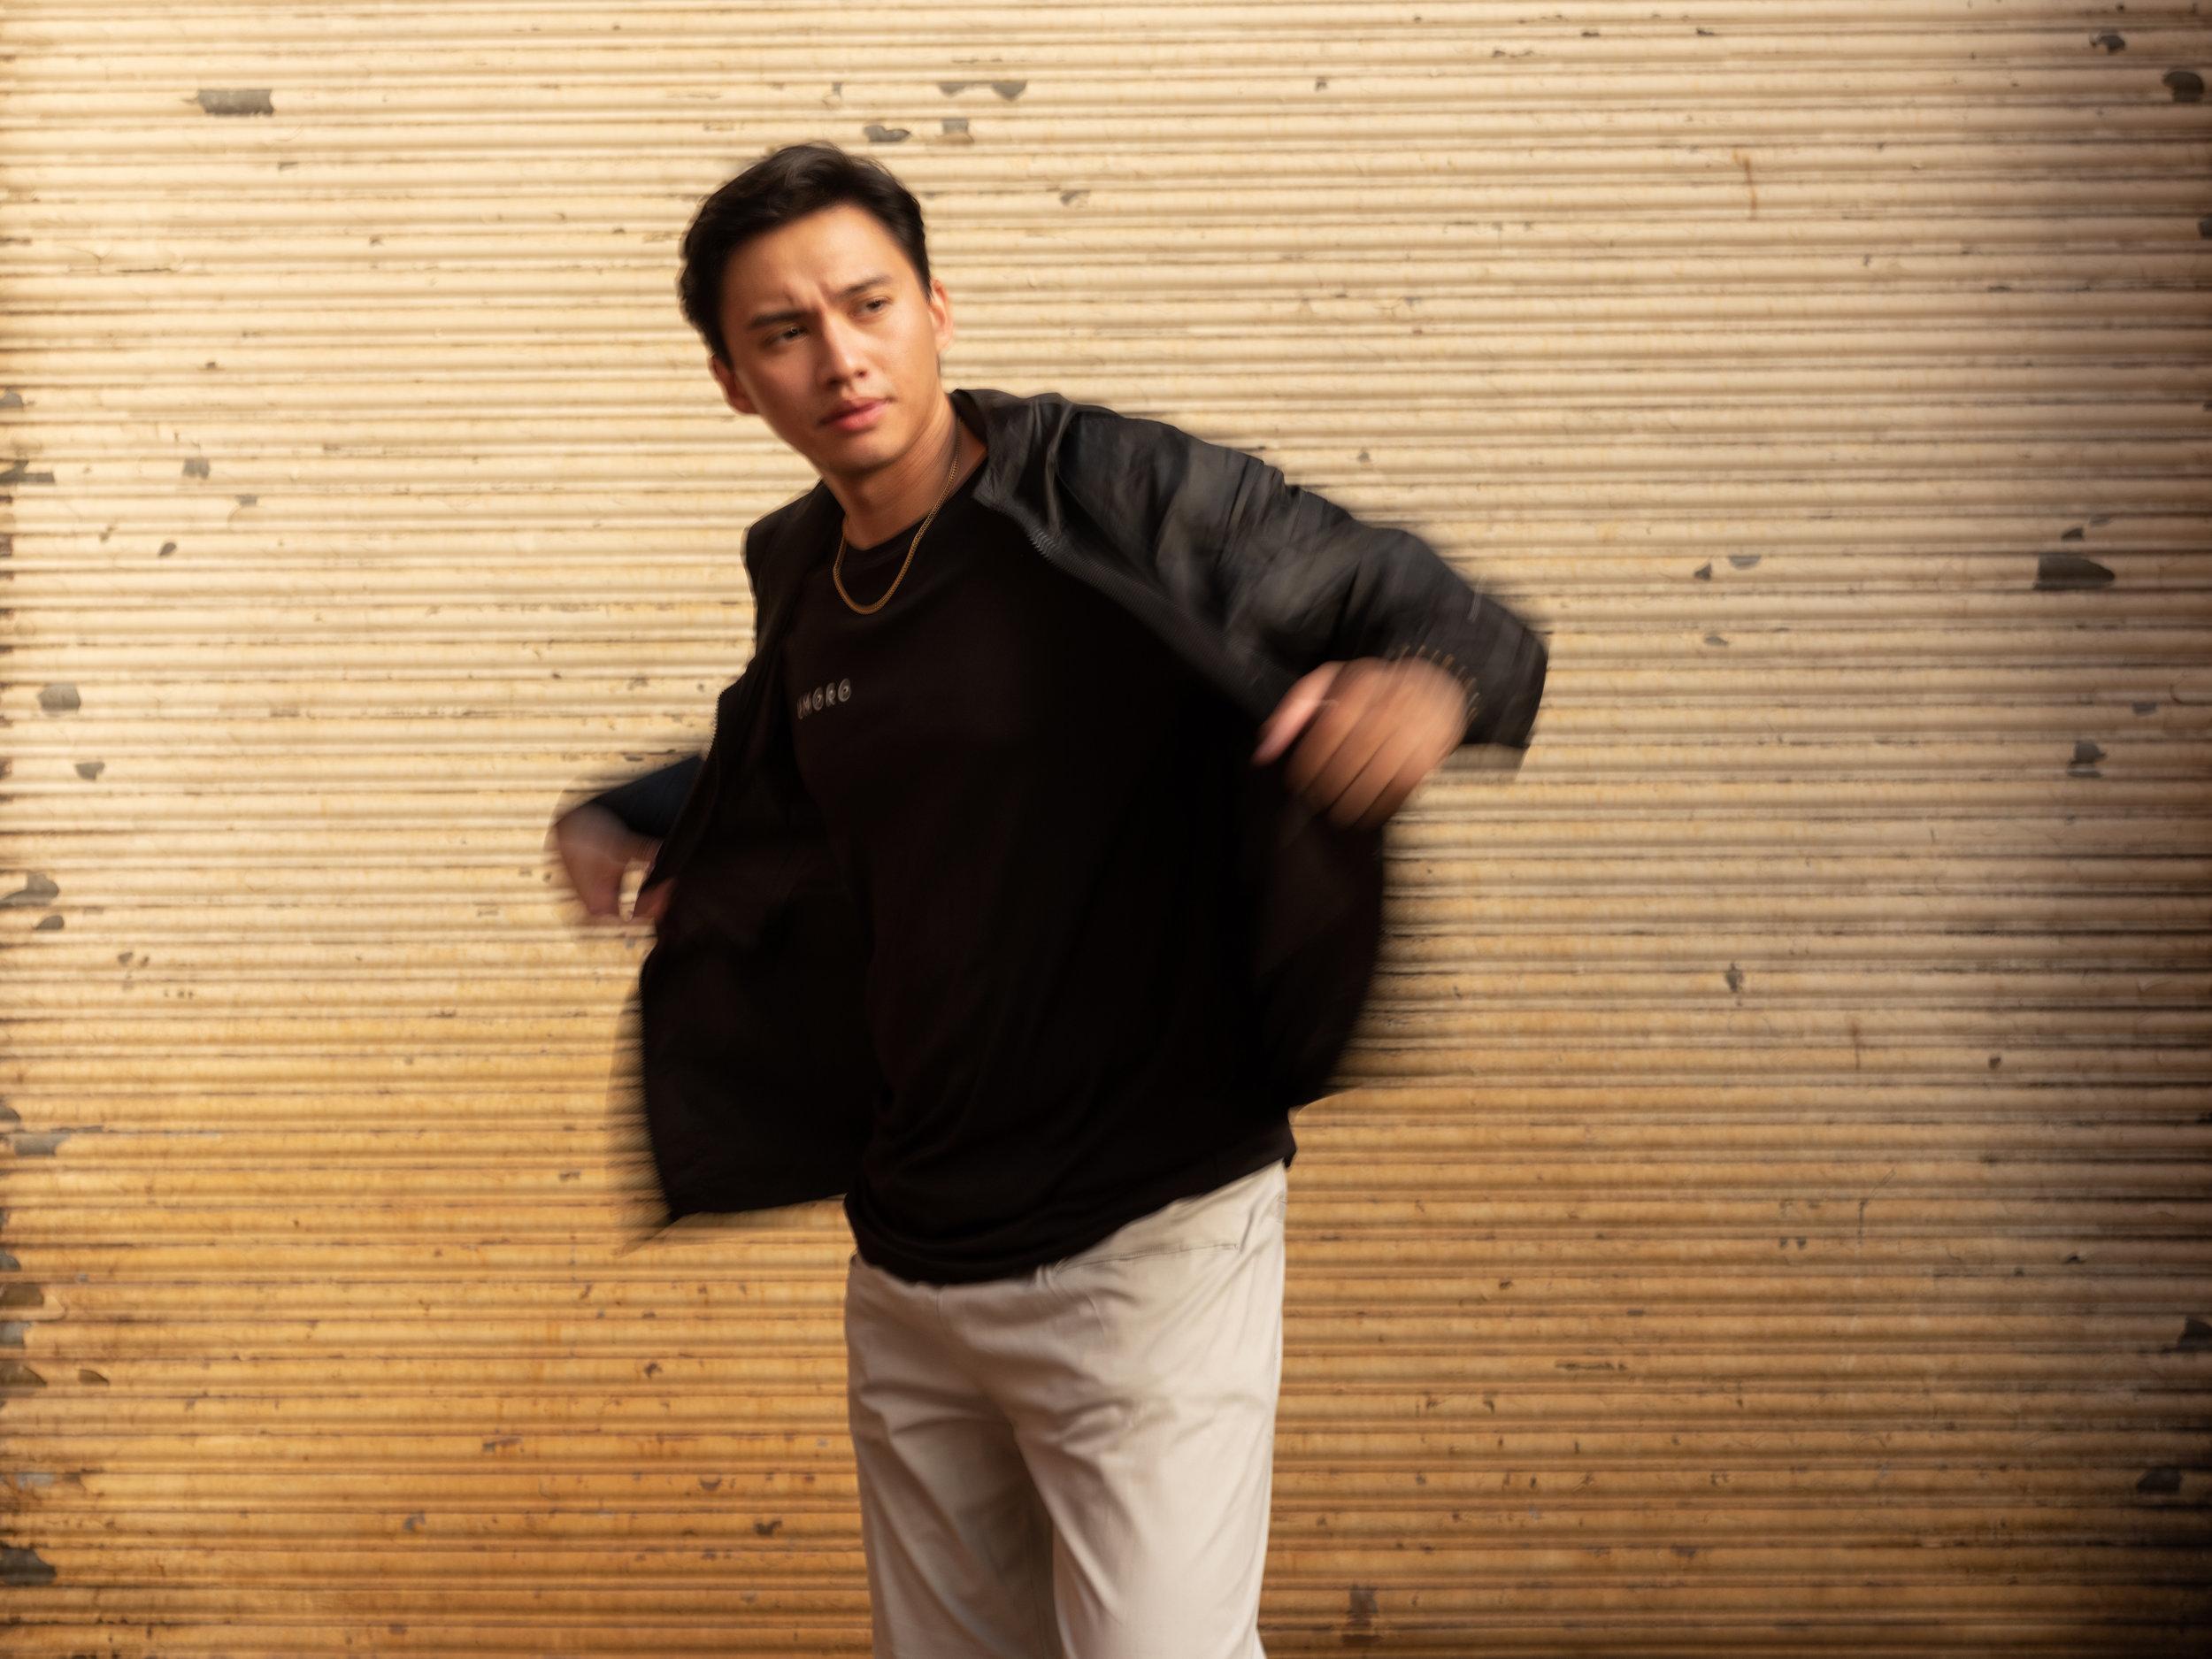 gfx50s, Umoro, toronto, UofT, street, style